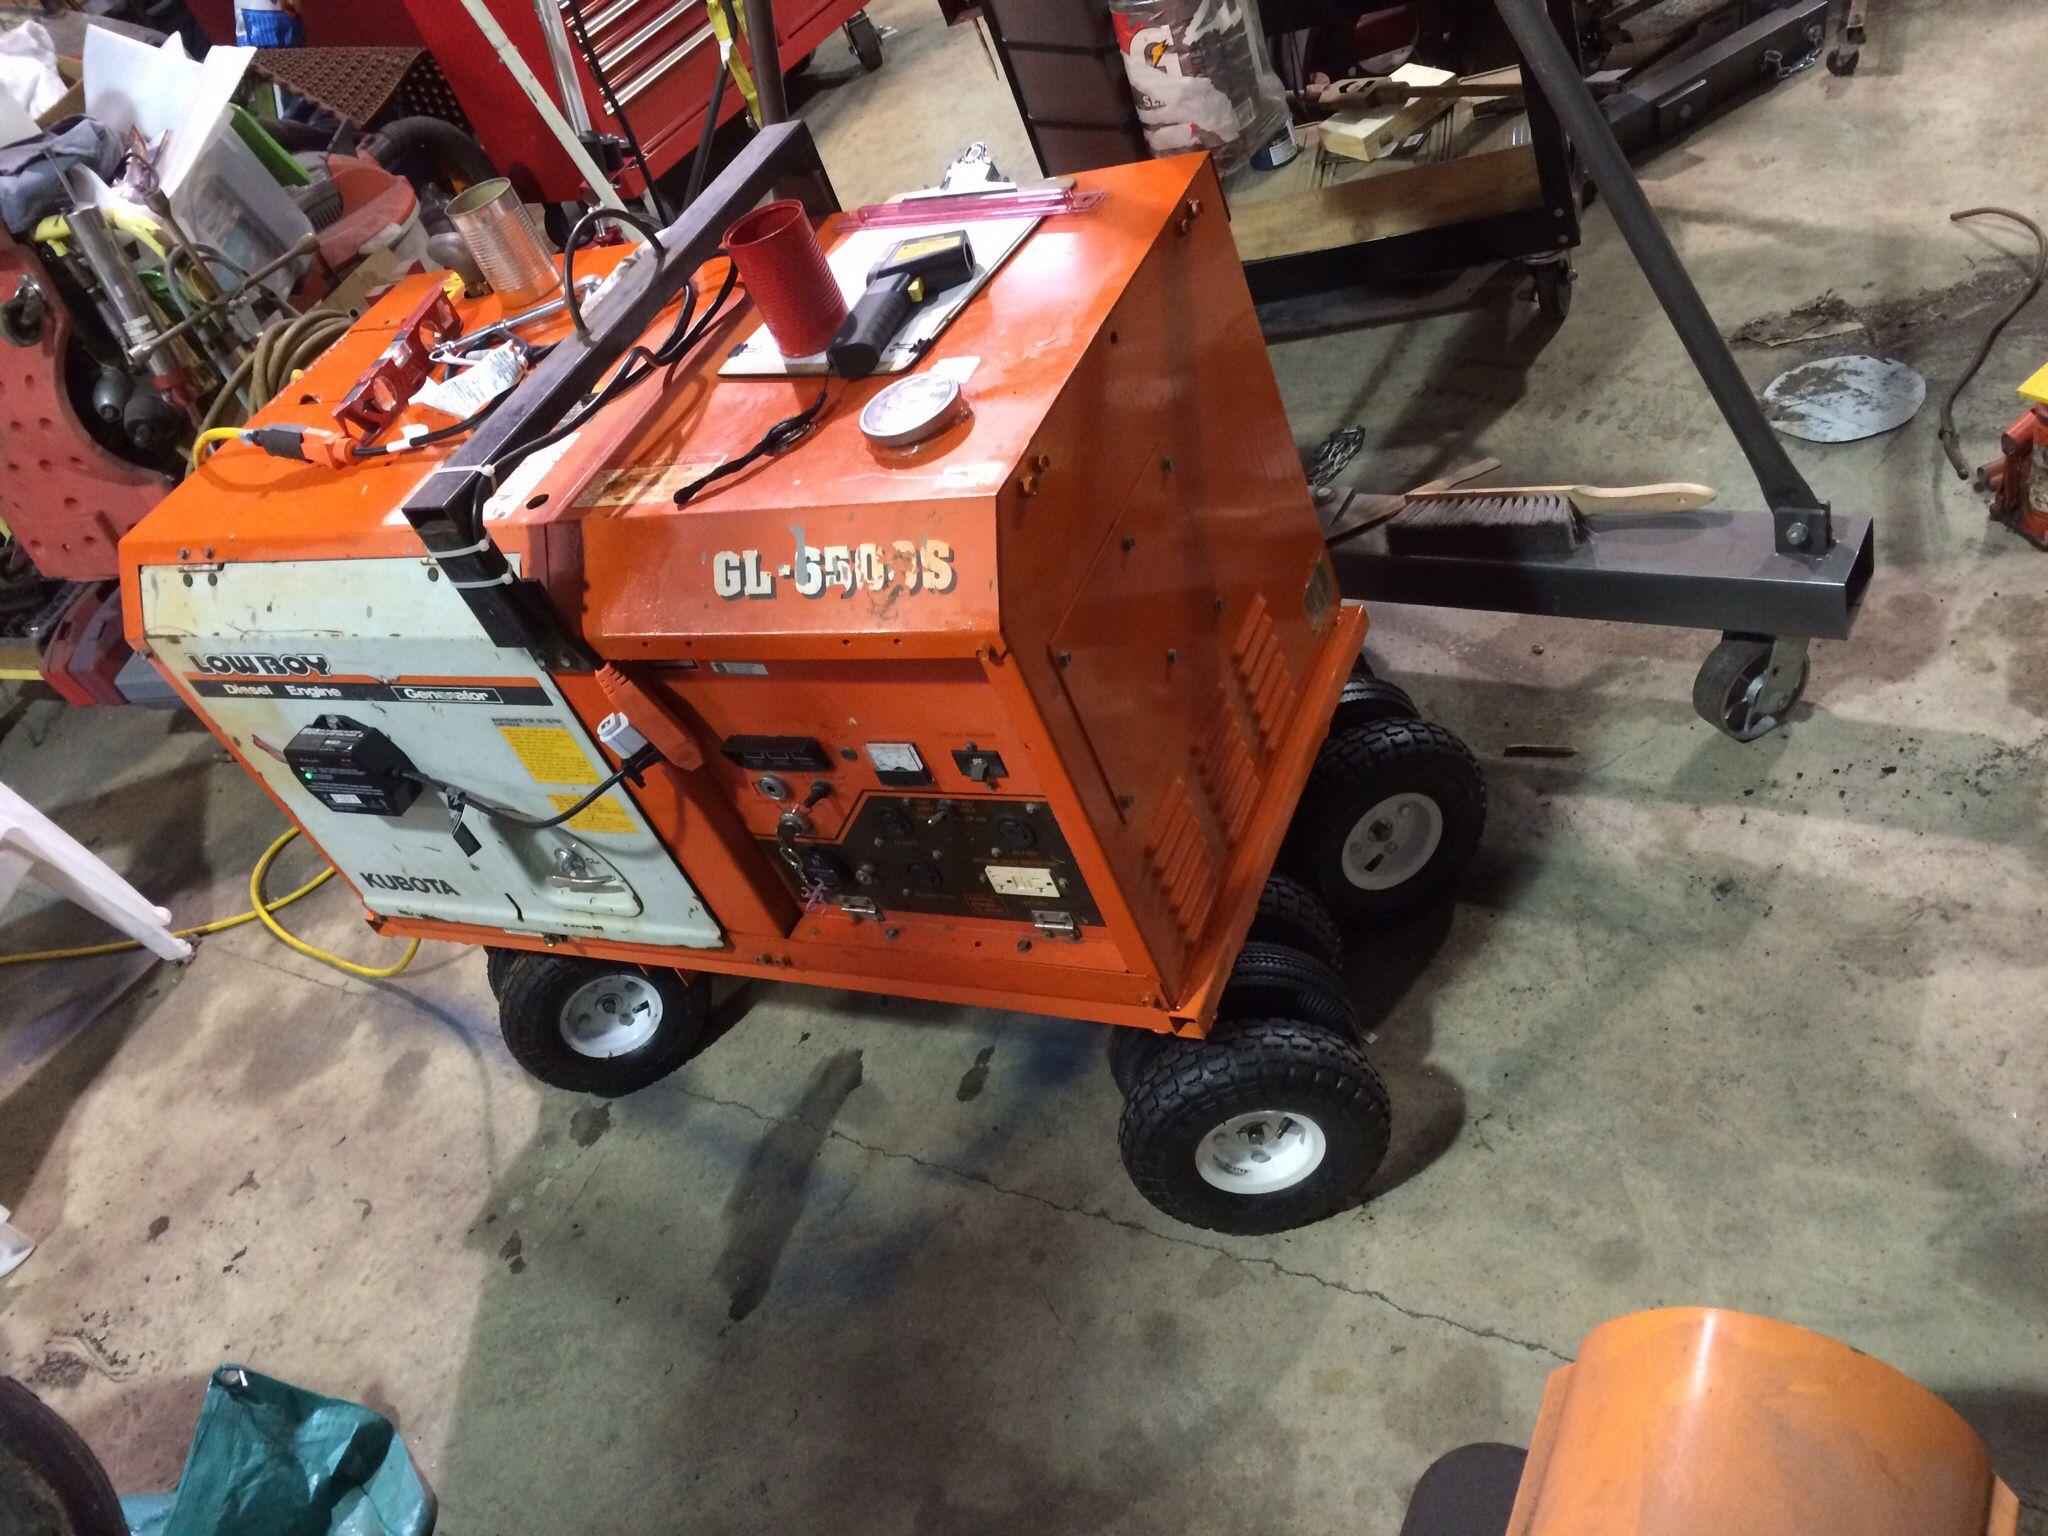 Kubota sel generator cart with triple bogey wheels to roll over